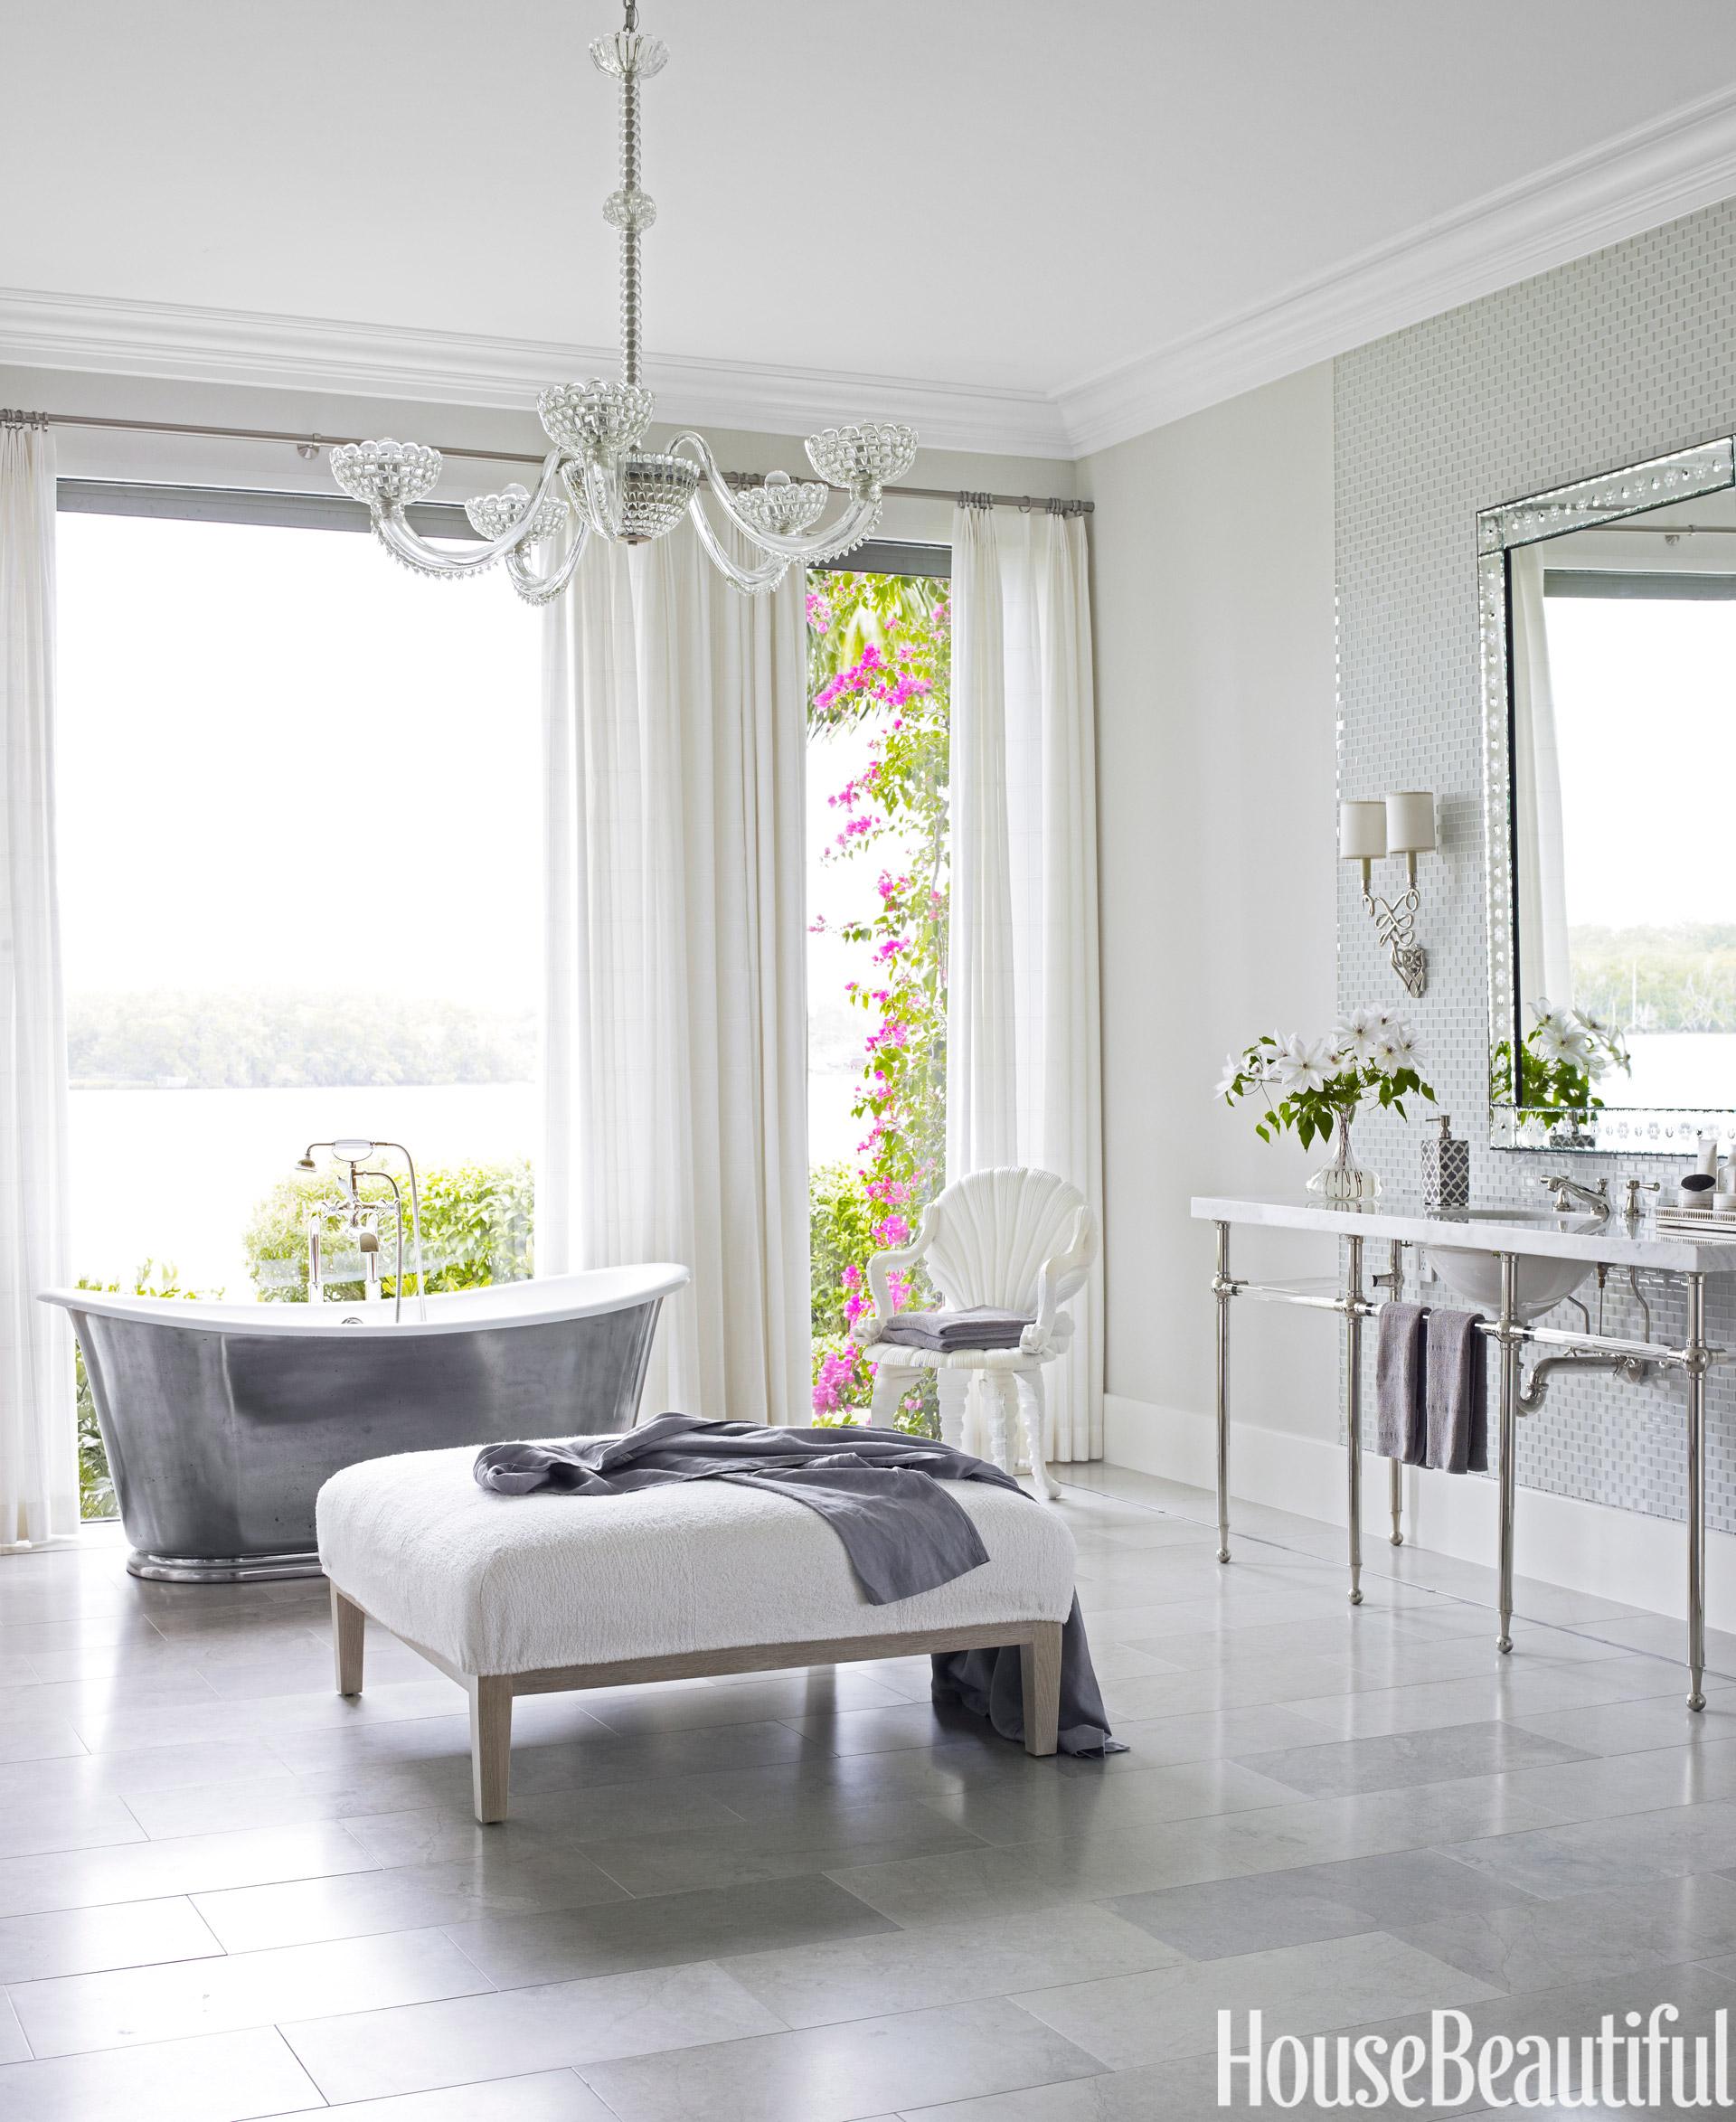 62 Best Fun Sales Blitz Ideas Images On Pinterest: Ultra Glamorous Bathrooms